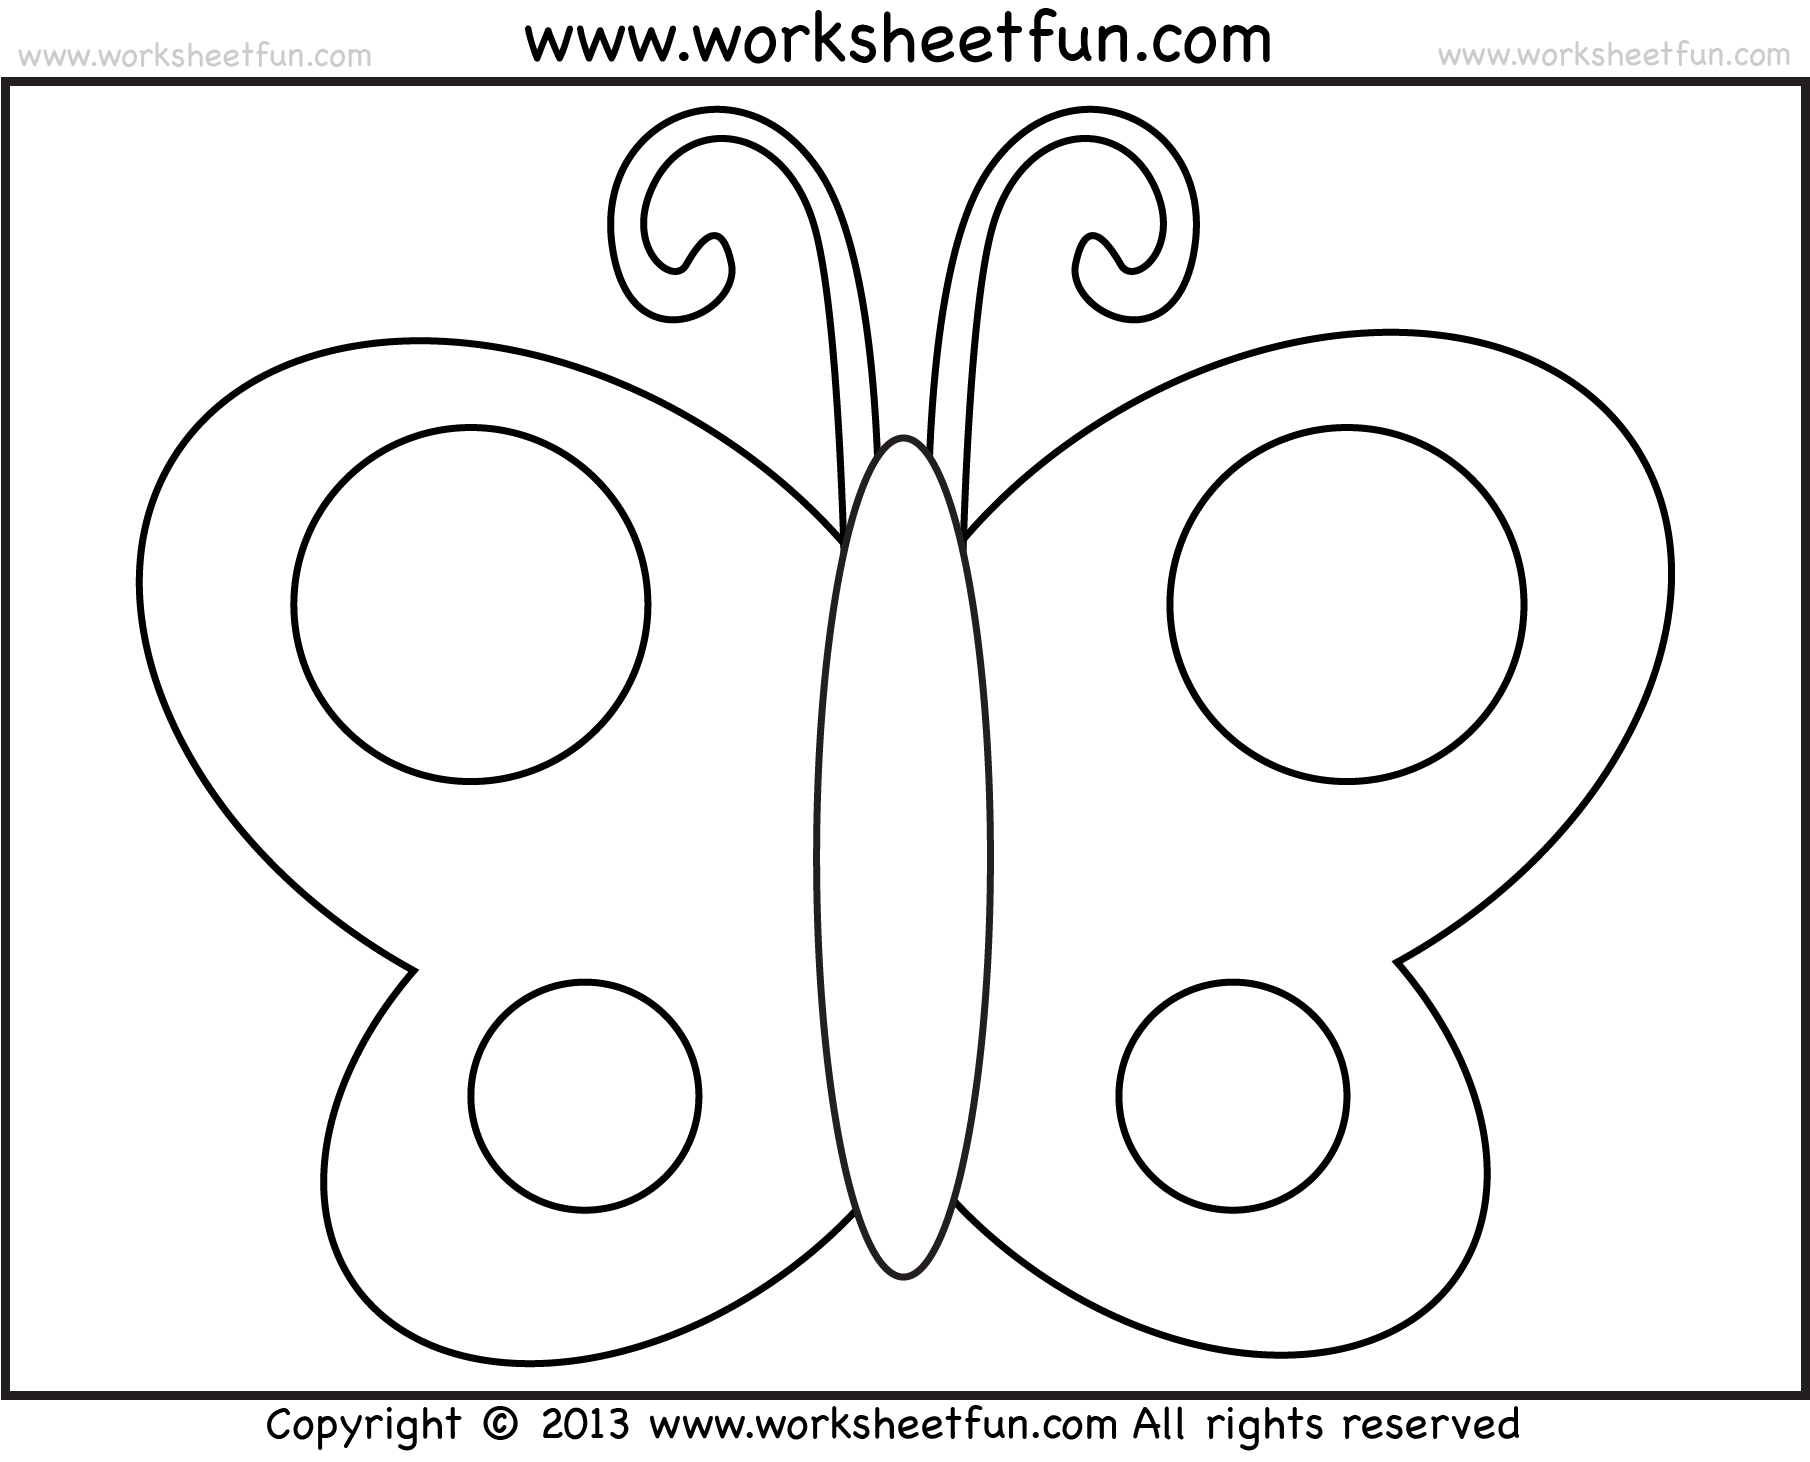 Drawing Worksheets For Preschoolers 5 Preschool